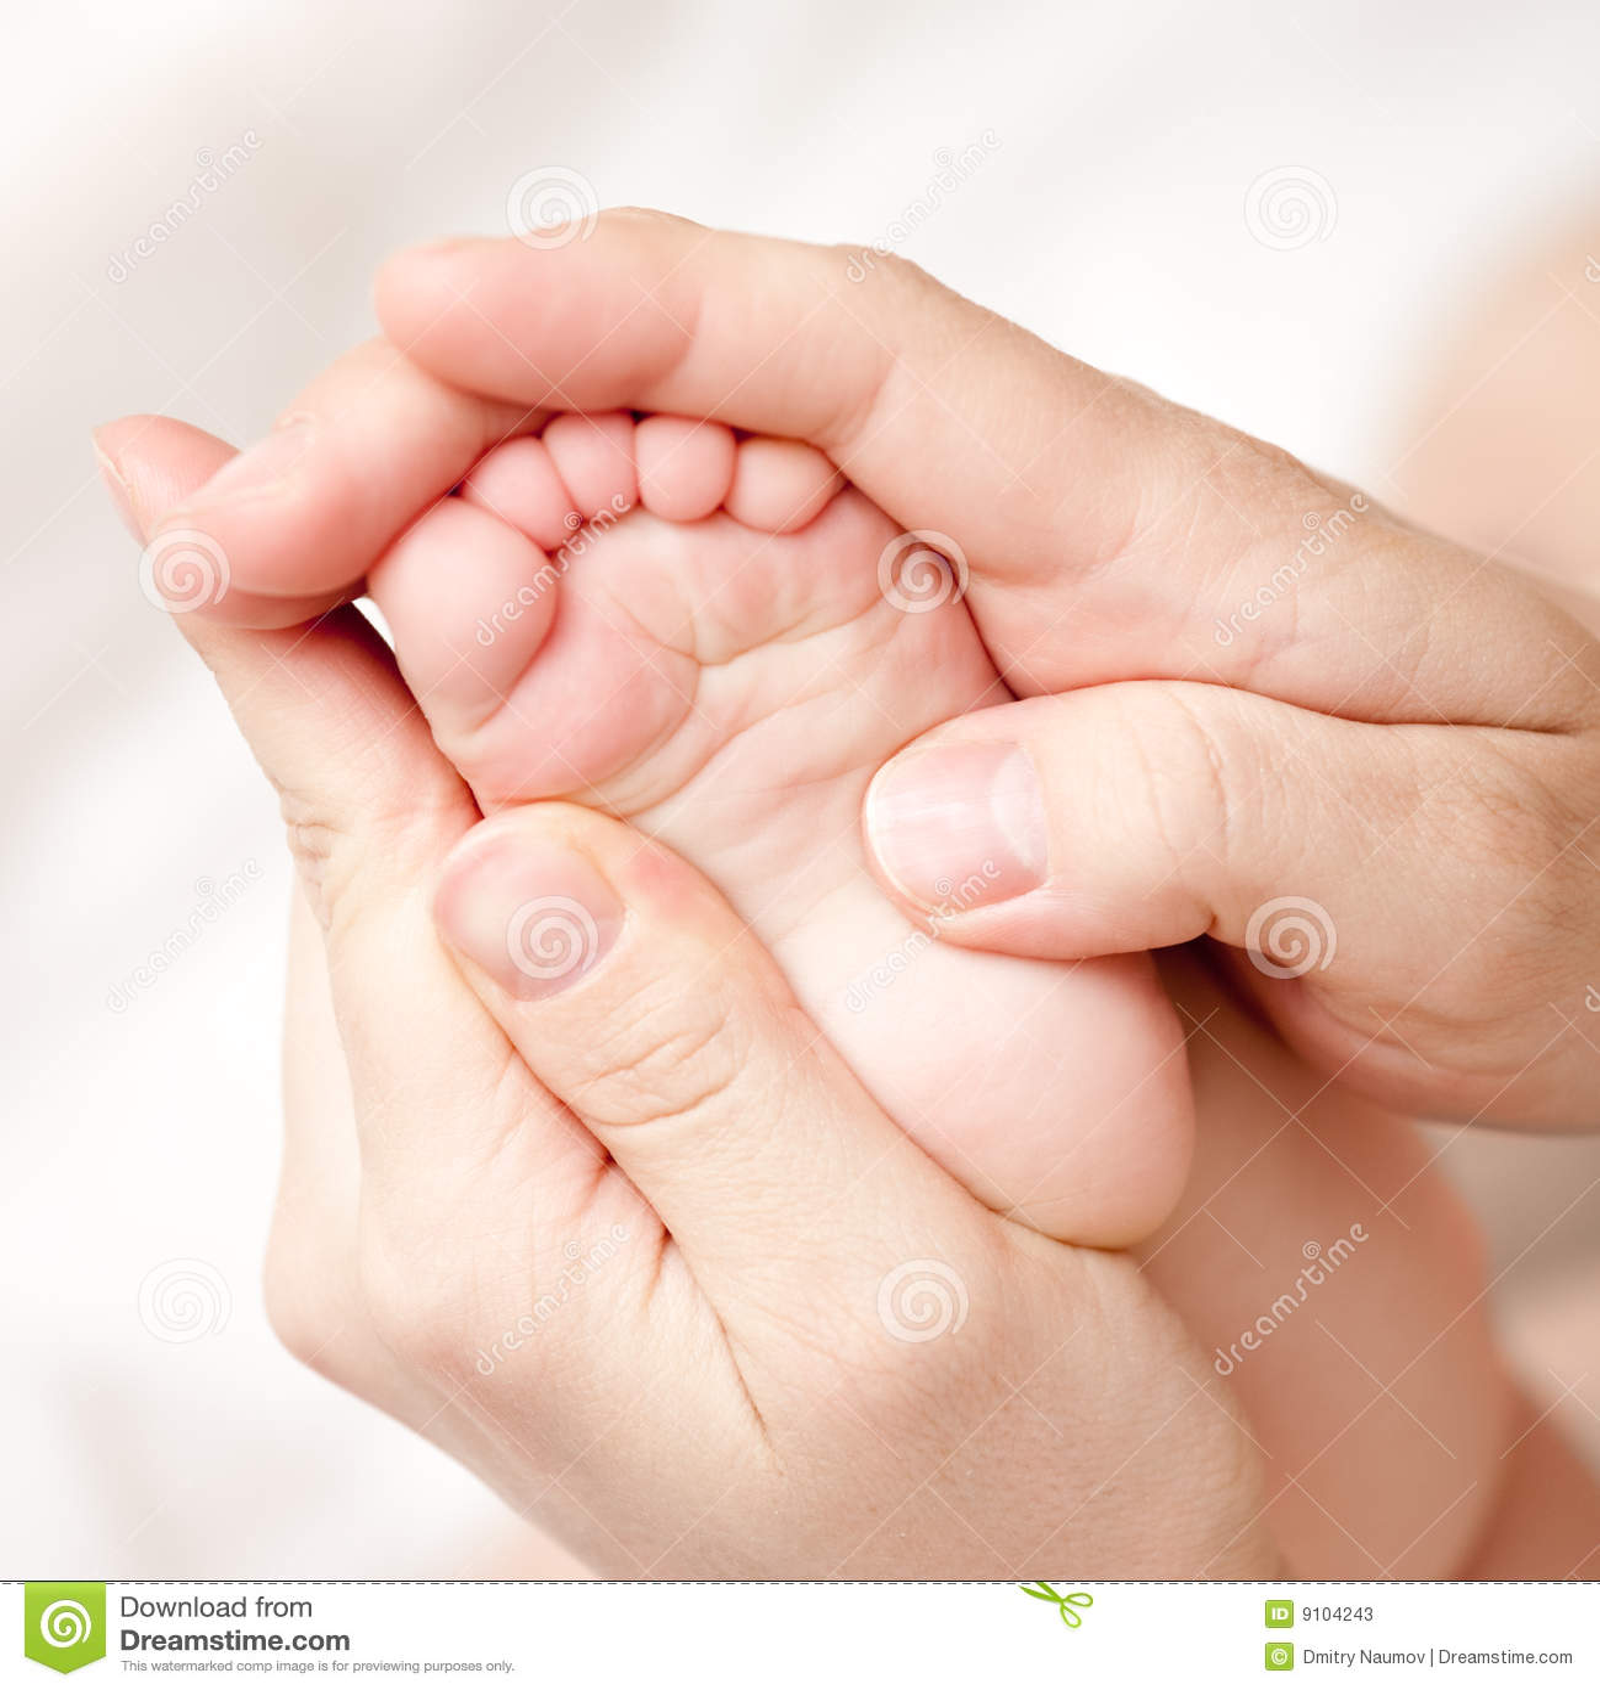 Foot massage stock image. Image of doctor, masseur